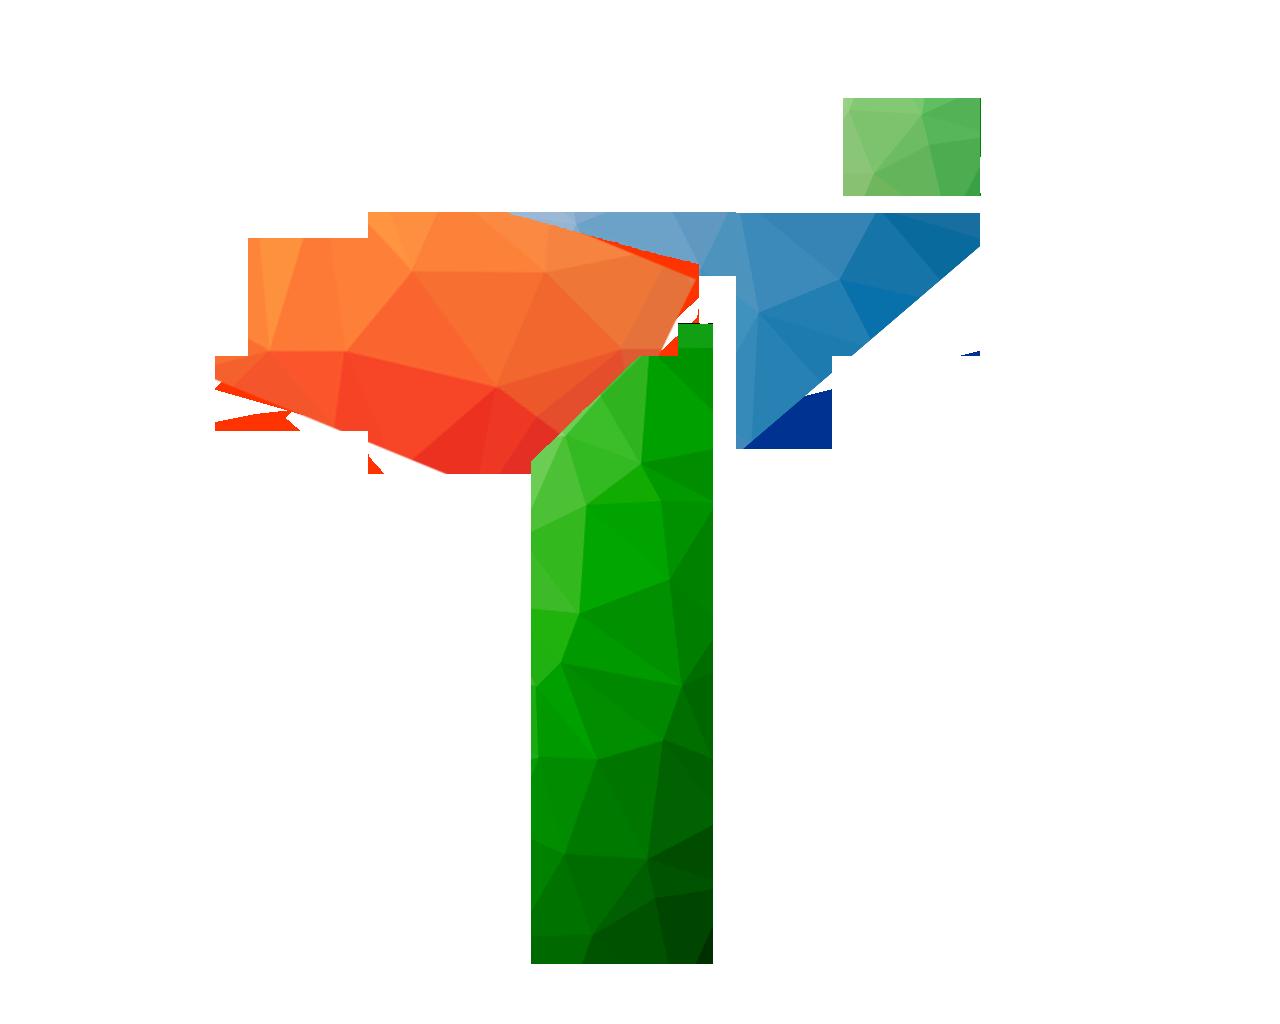 Teknodeon 2k17